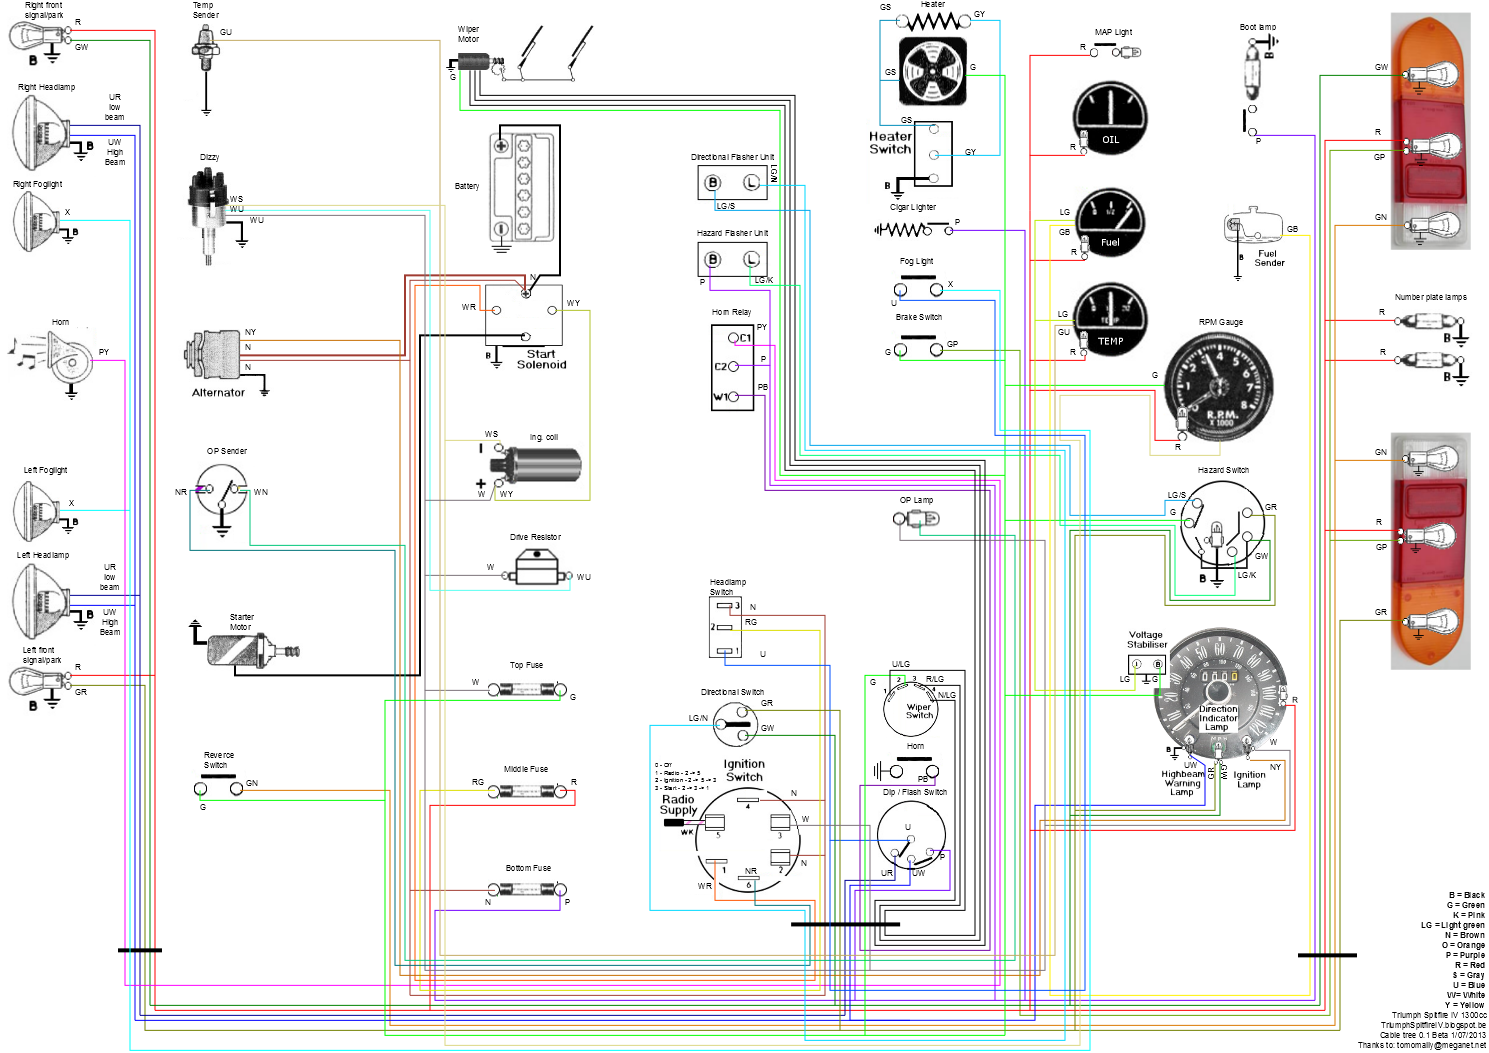 small resolution of 1970 tr6 wiring diagrams wiring diagram triumph tr6 transmission triumph tr6 fog lamp wiring diagram